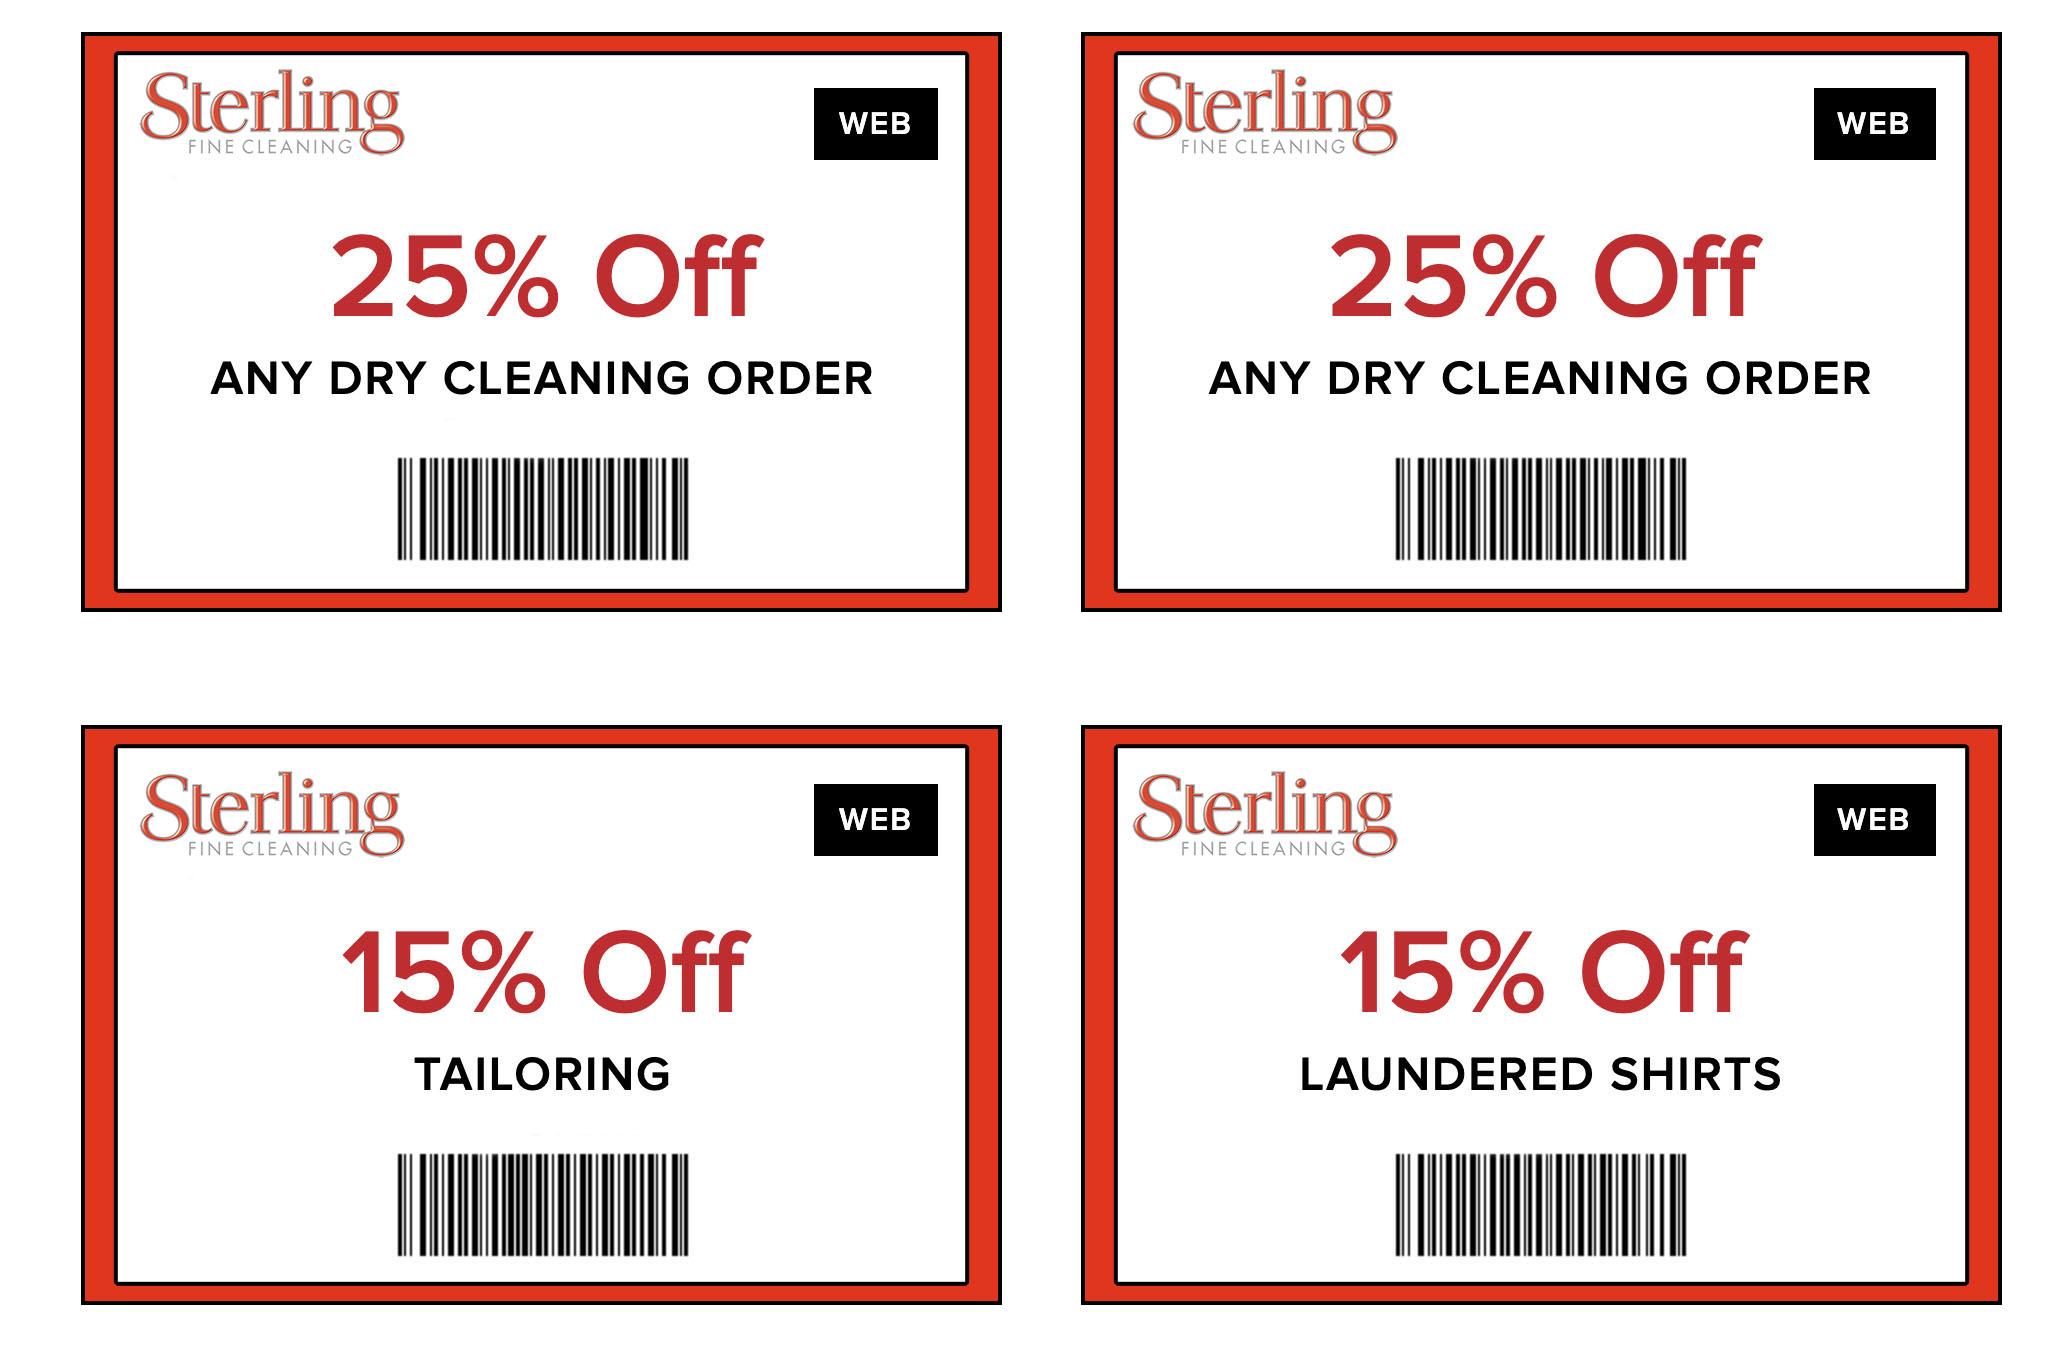 sterling coupons.jpg